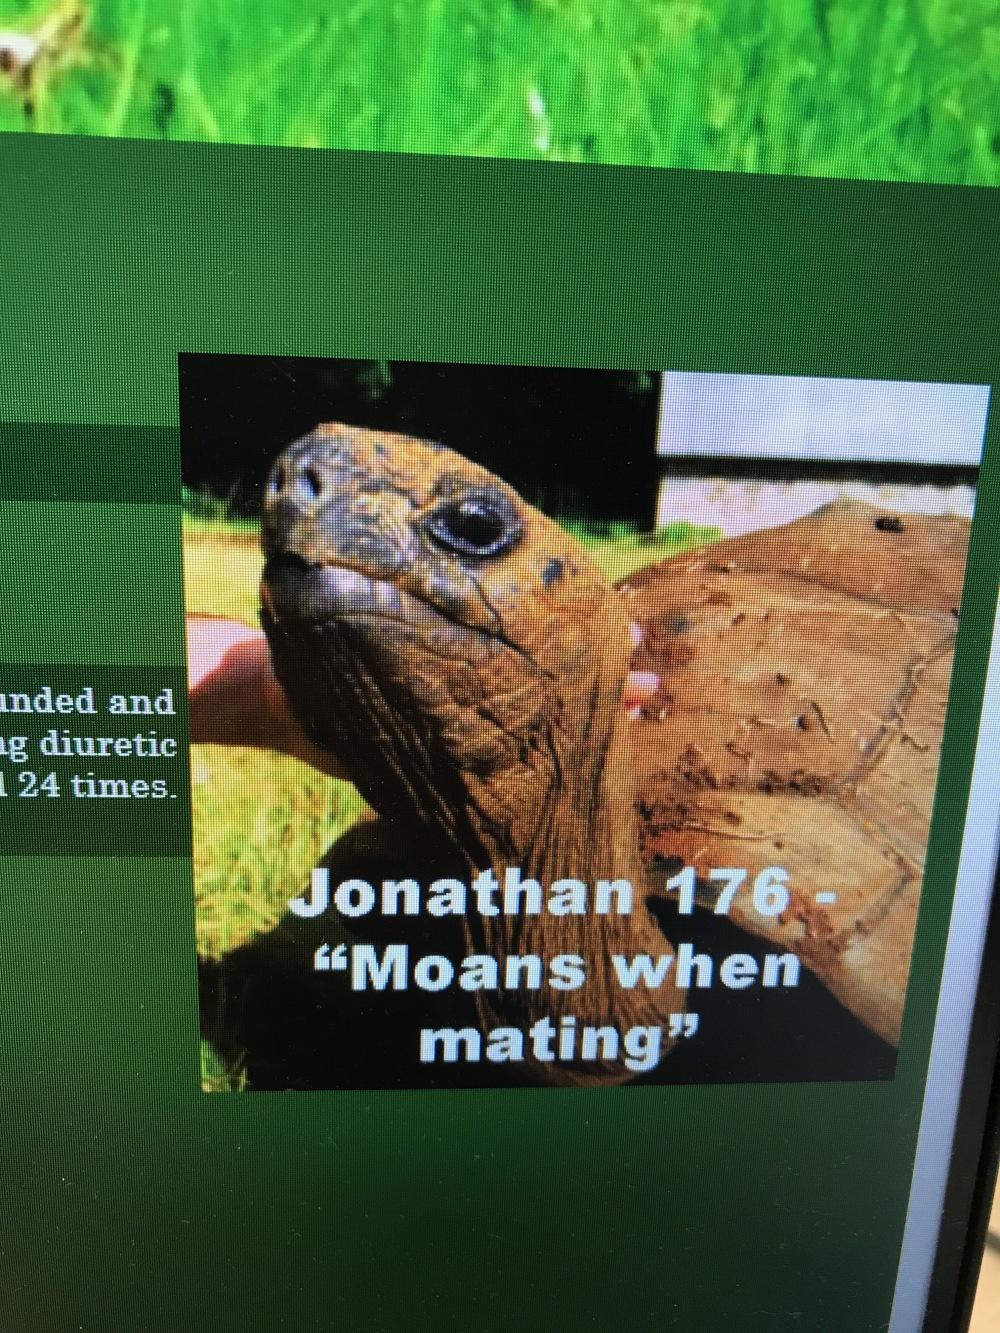 A reptile dysfunction